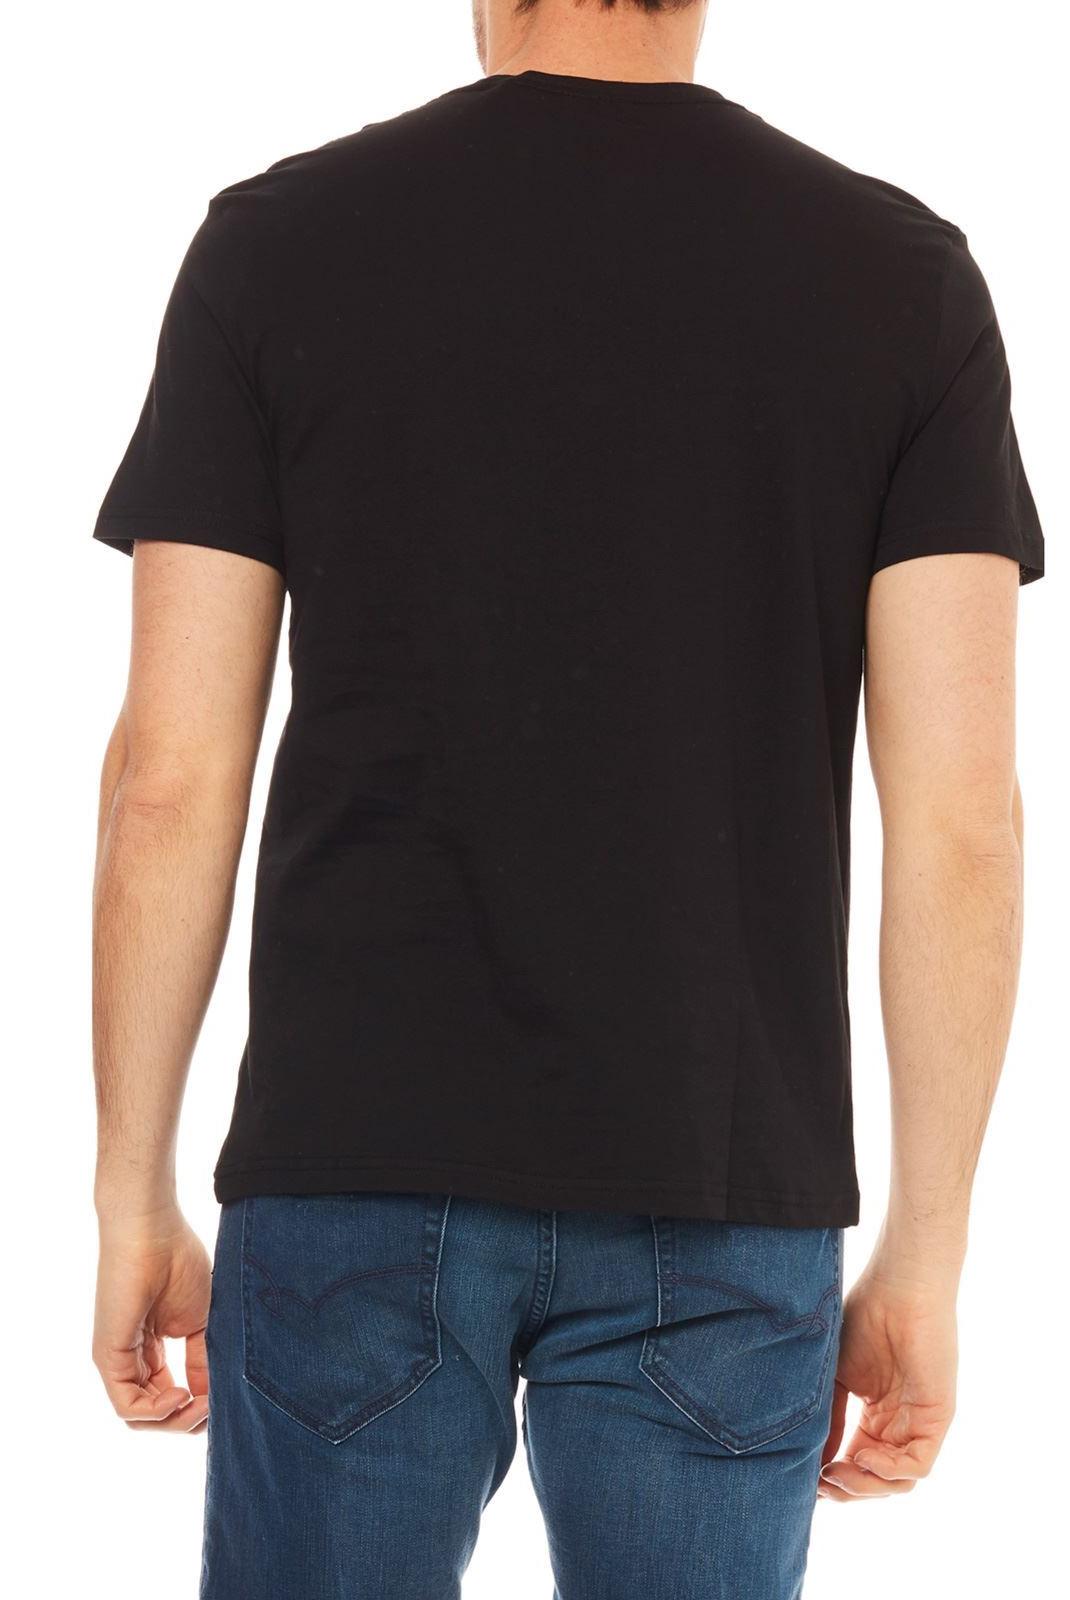 Tee-shirts  Kaporal POGGO BLACK